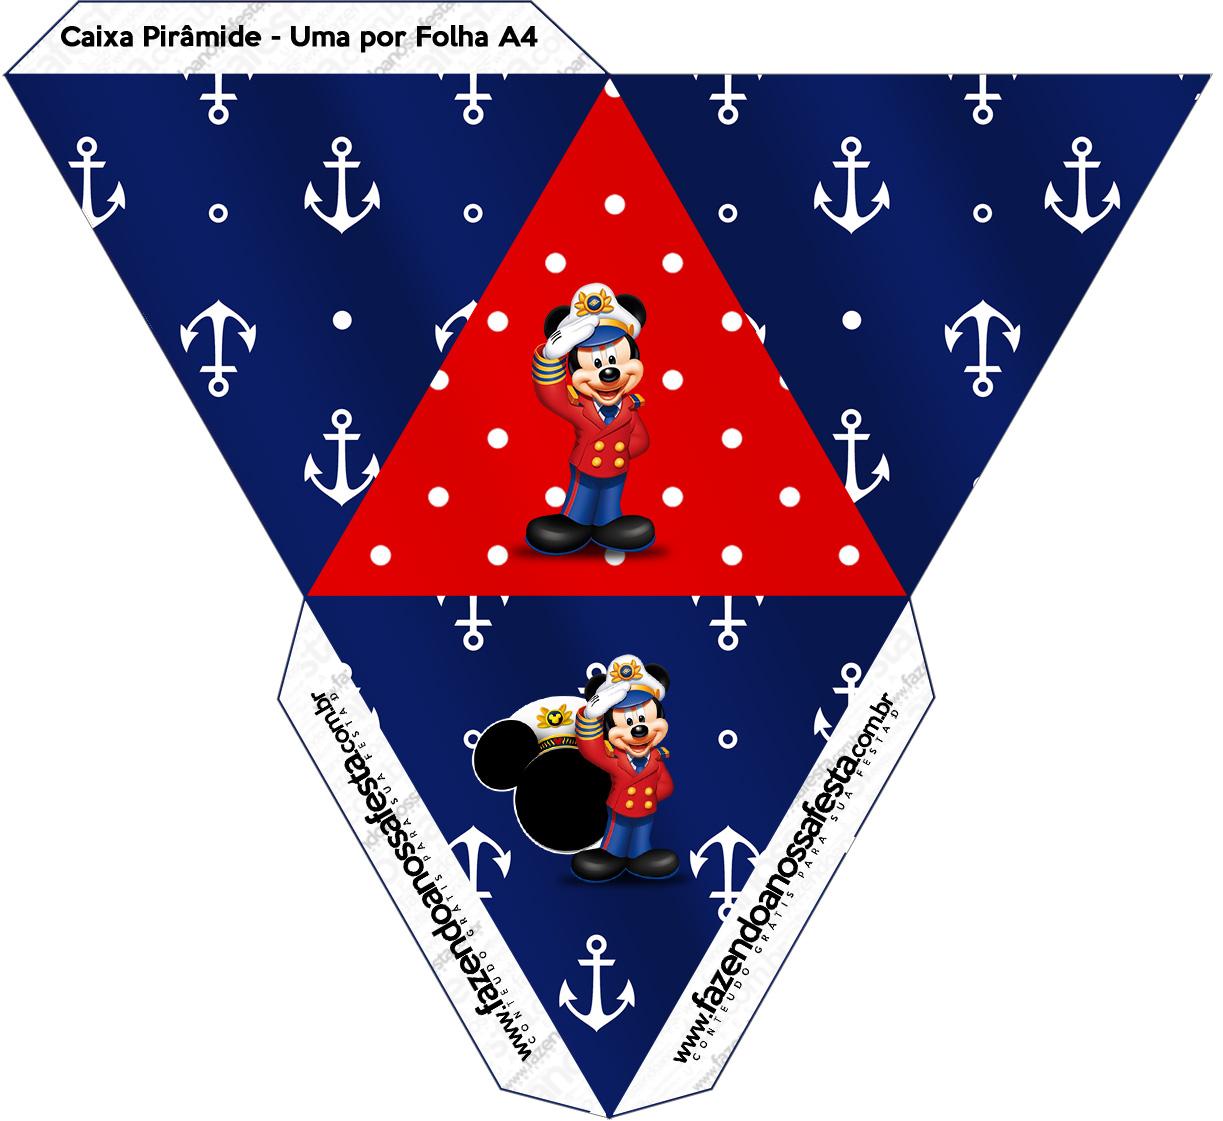 Caixa Pirâmide 2 Mickey Marinheiro